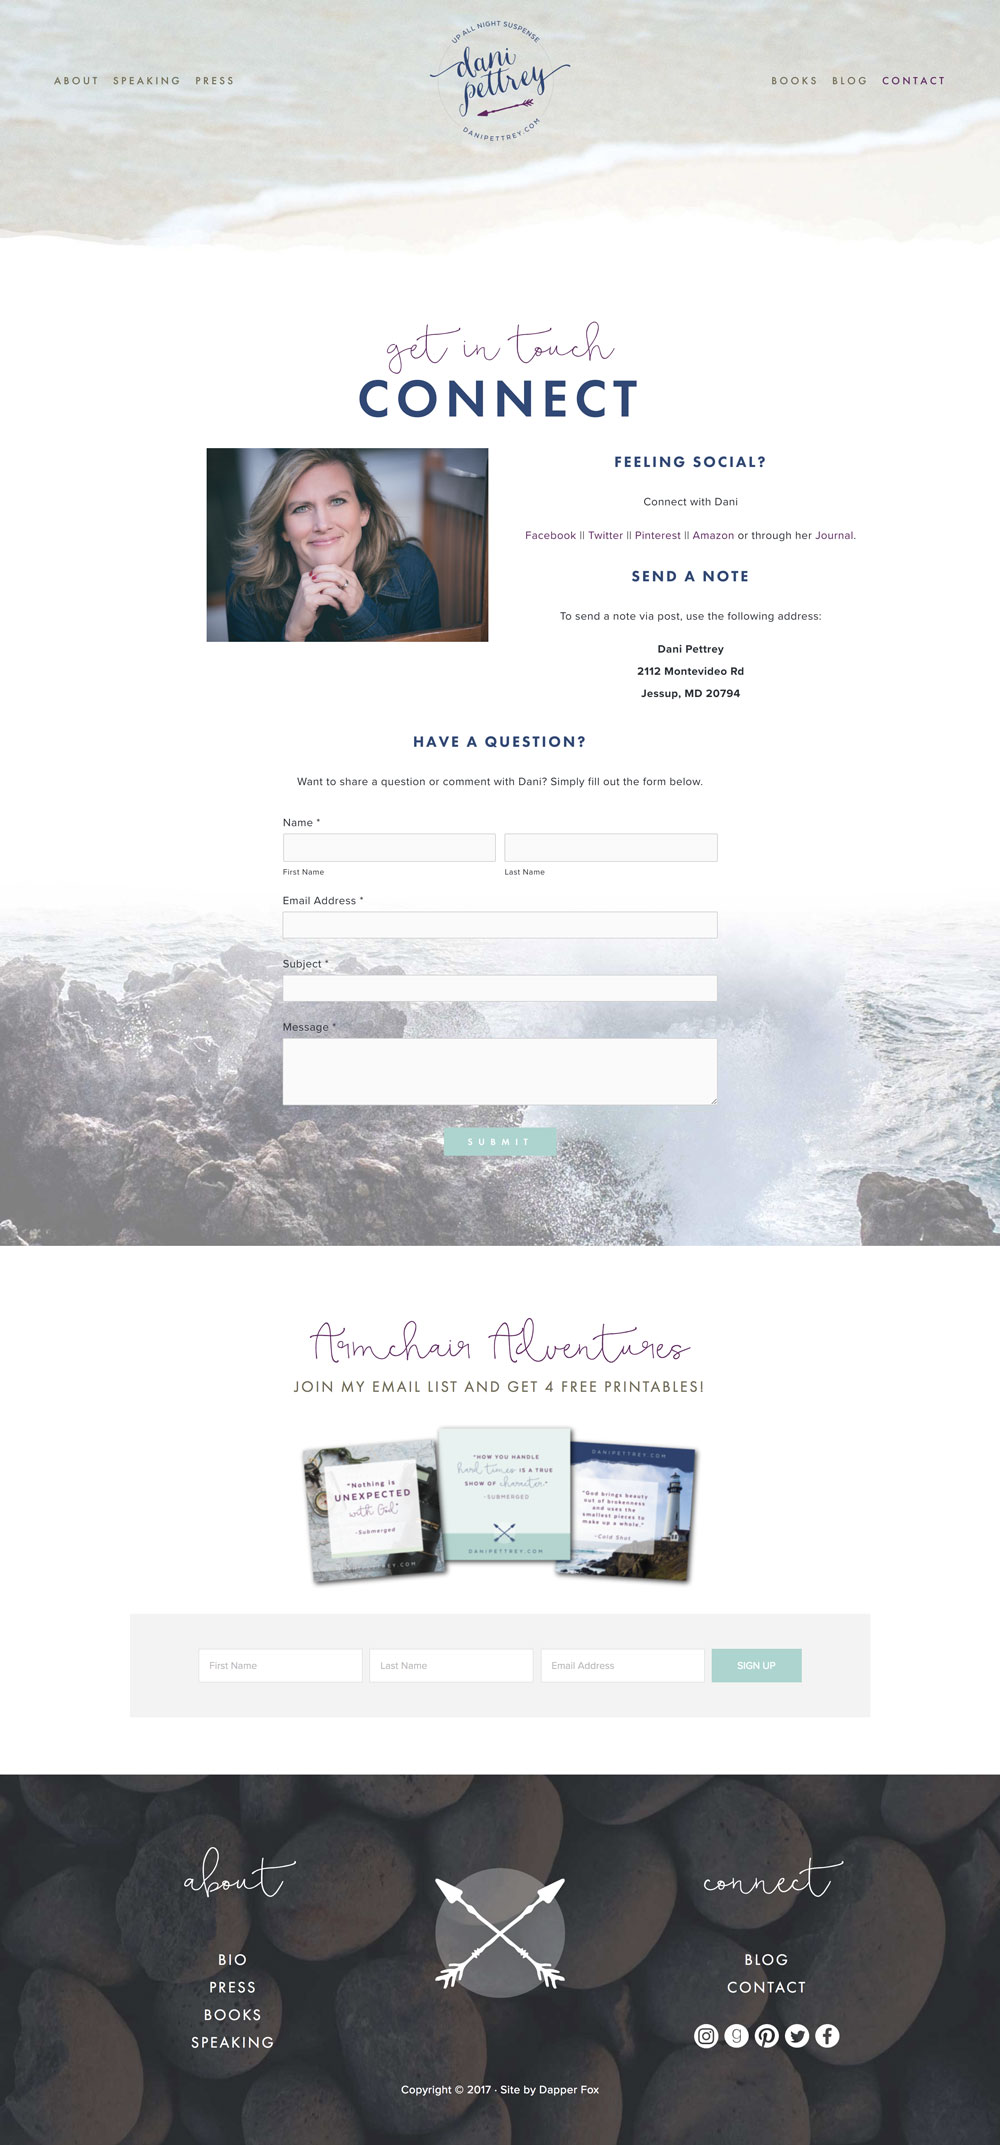 Dani Pettrey Award Winning Book Author Wordpress Website and Branding Design #Coastal #Beach #Ocean #Design #Modern